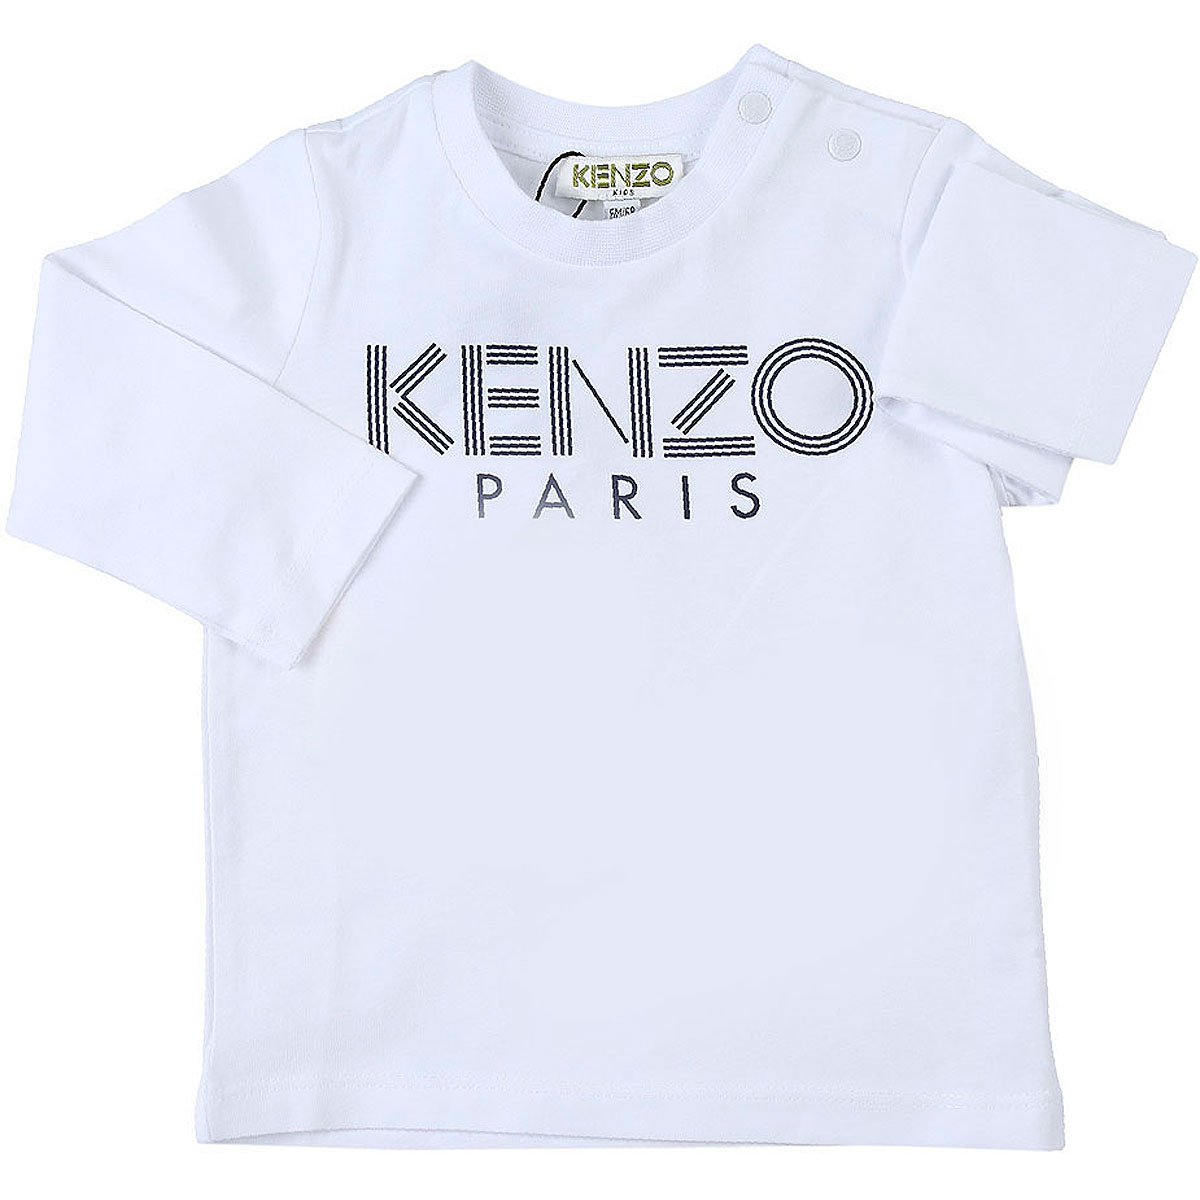 Kenzo Baby T-Shirt for Boys On Sale, White, Cotton, 2019, 12 M 18M 2Y 3Y 6M 9 M 9M